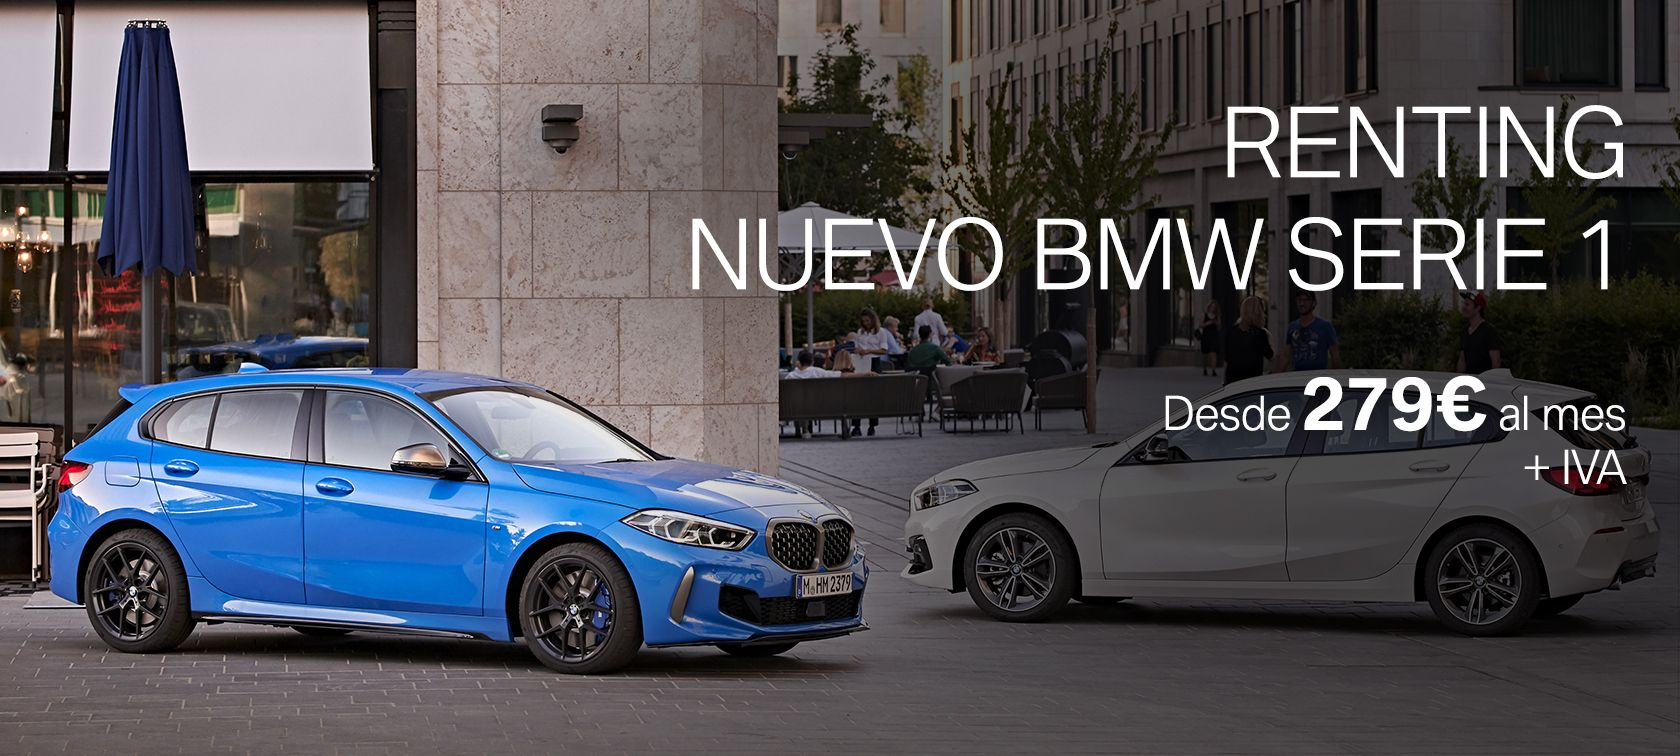 RENTING NUEVO BMW SERIE 1